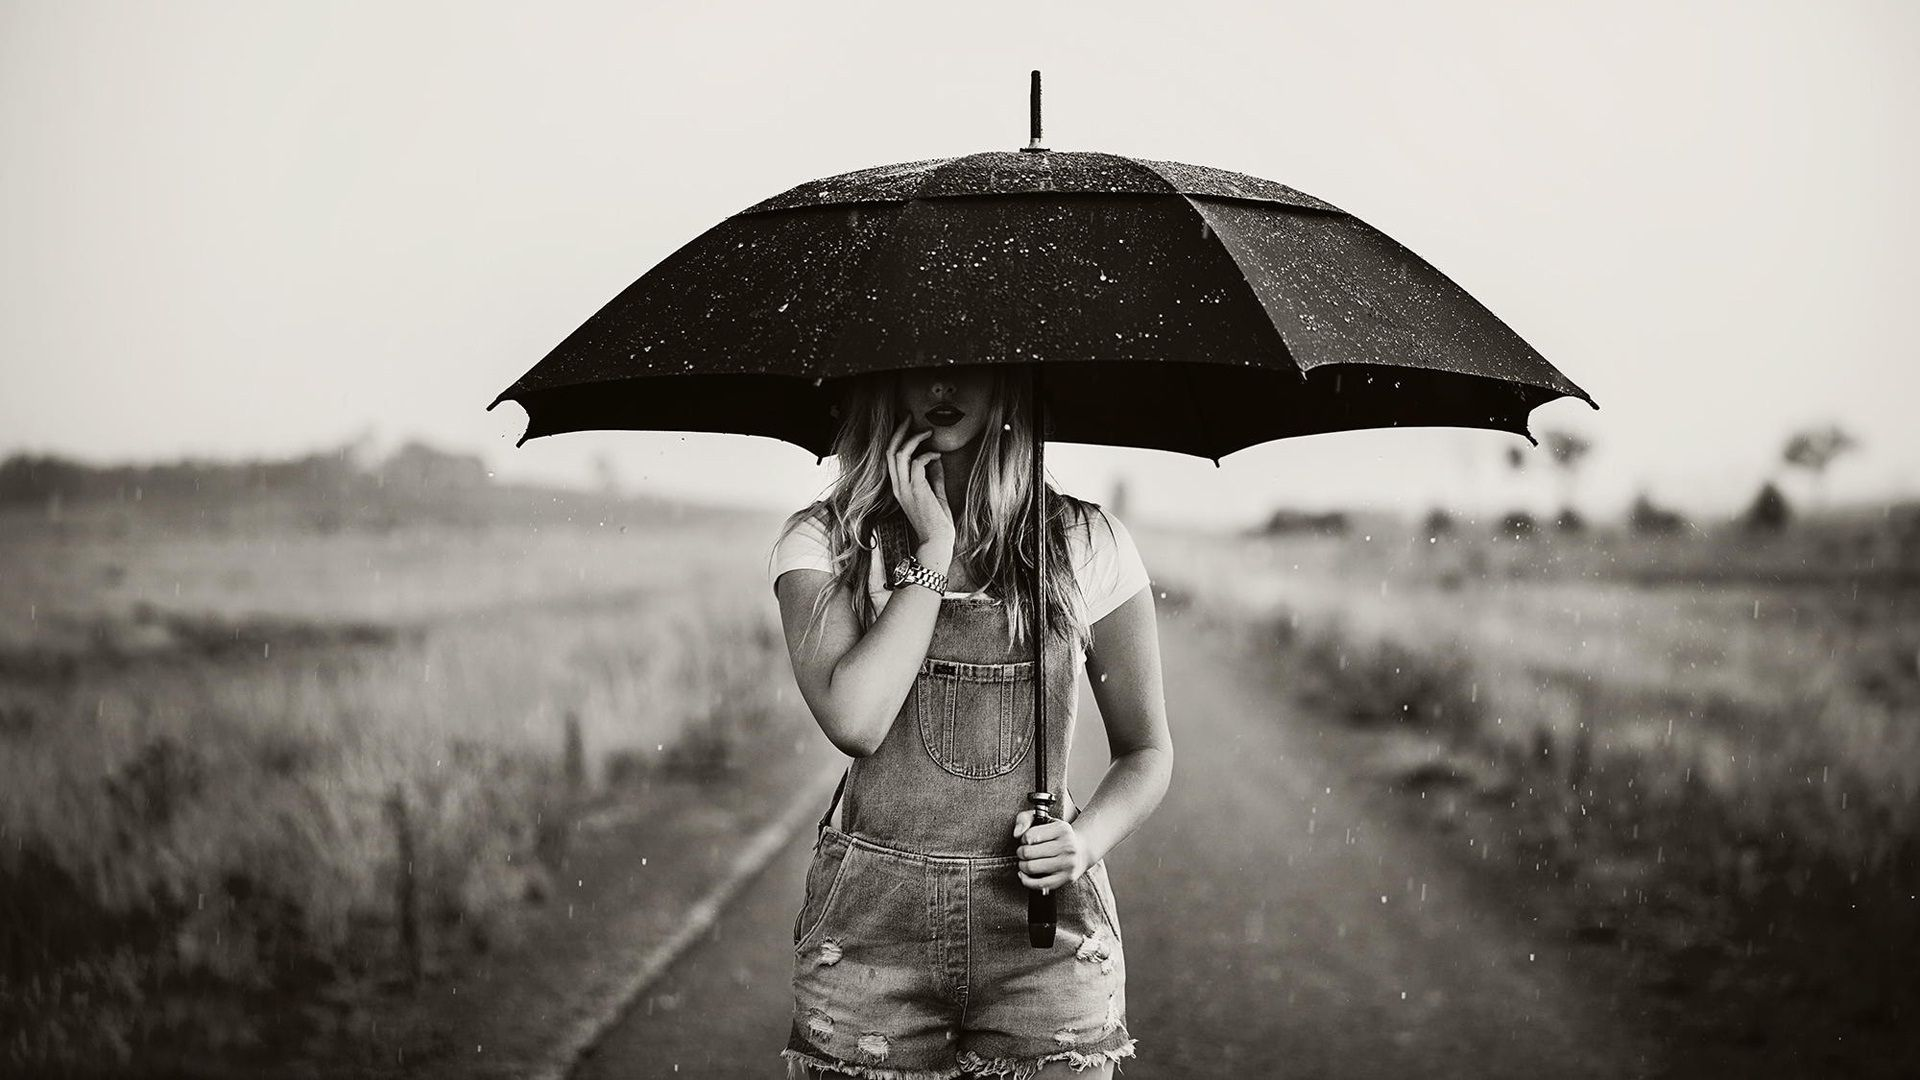 Sad Rain Wallpaper Full HD Free Download Wallpaper ...